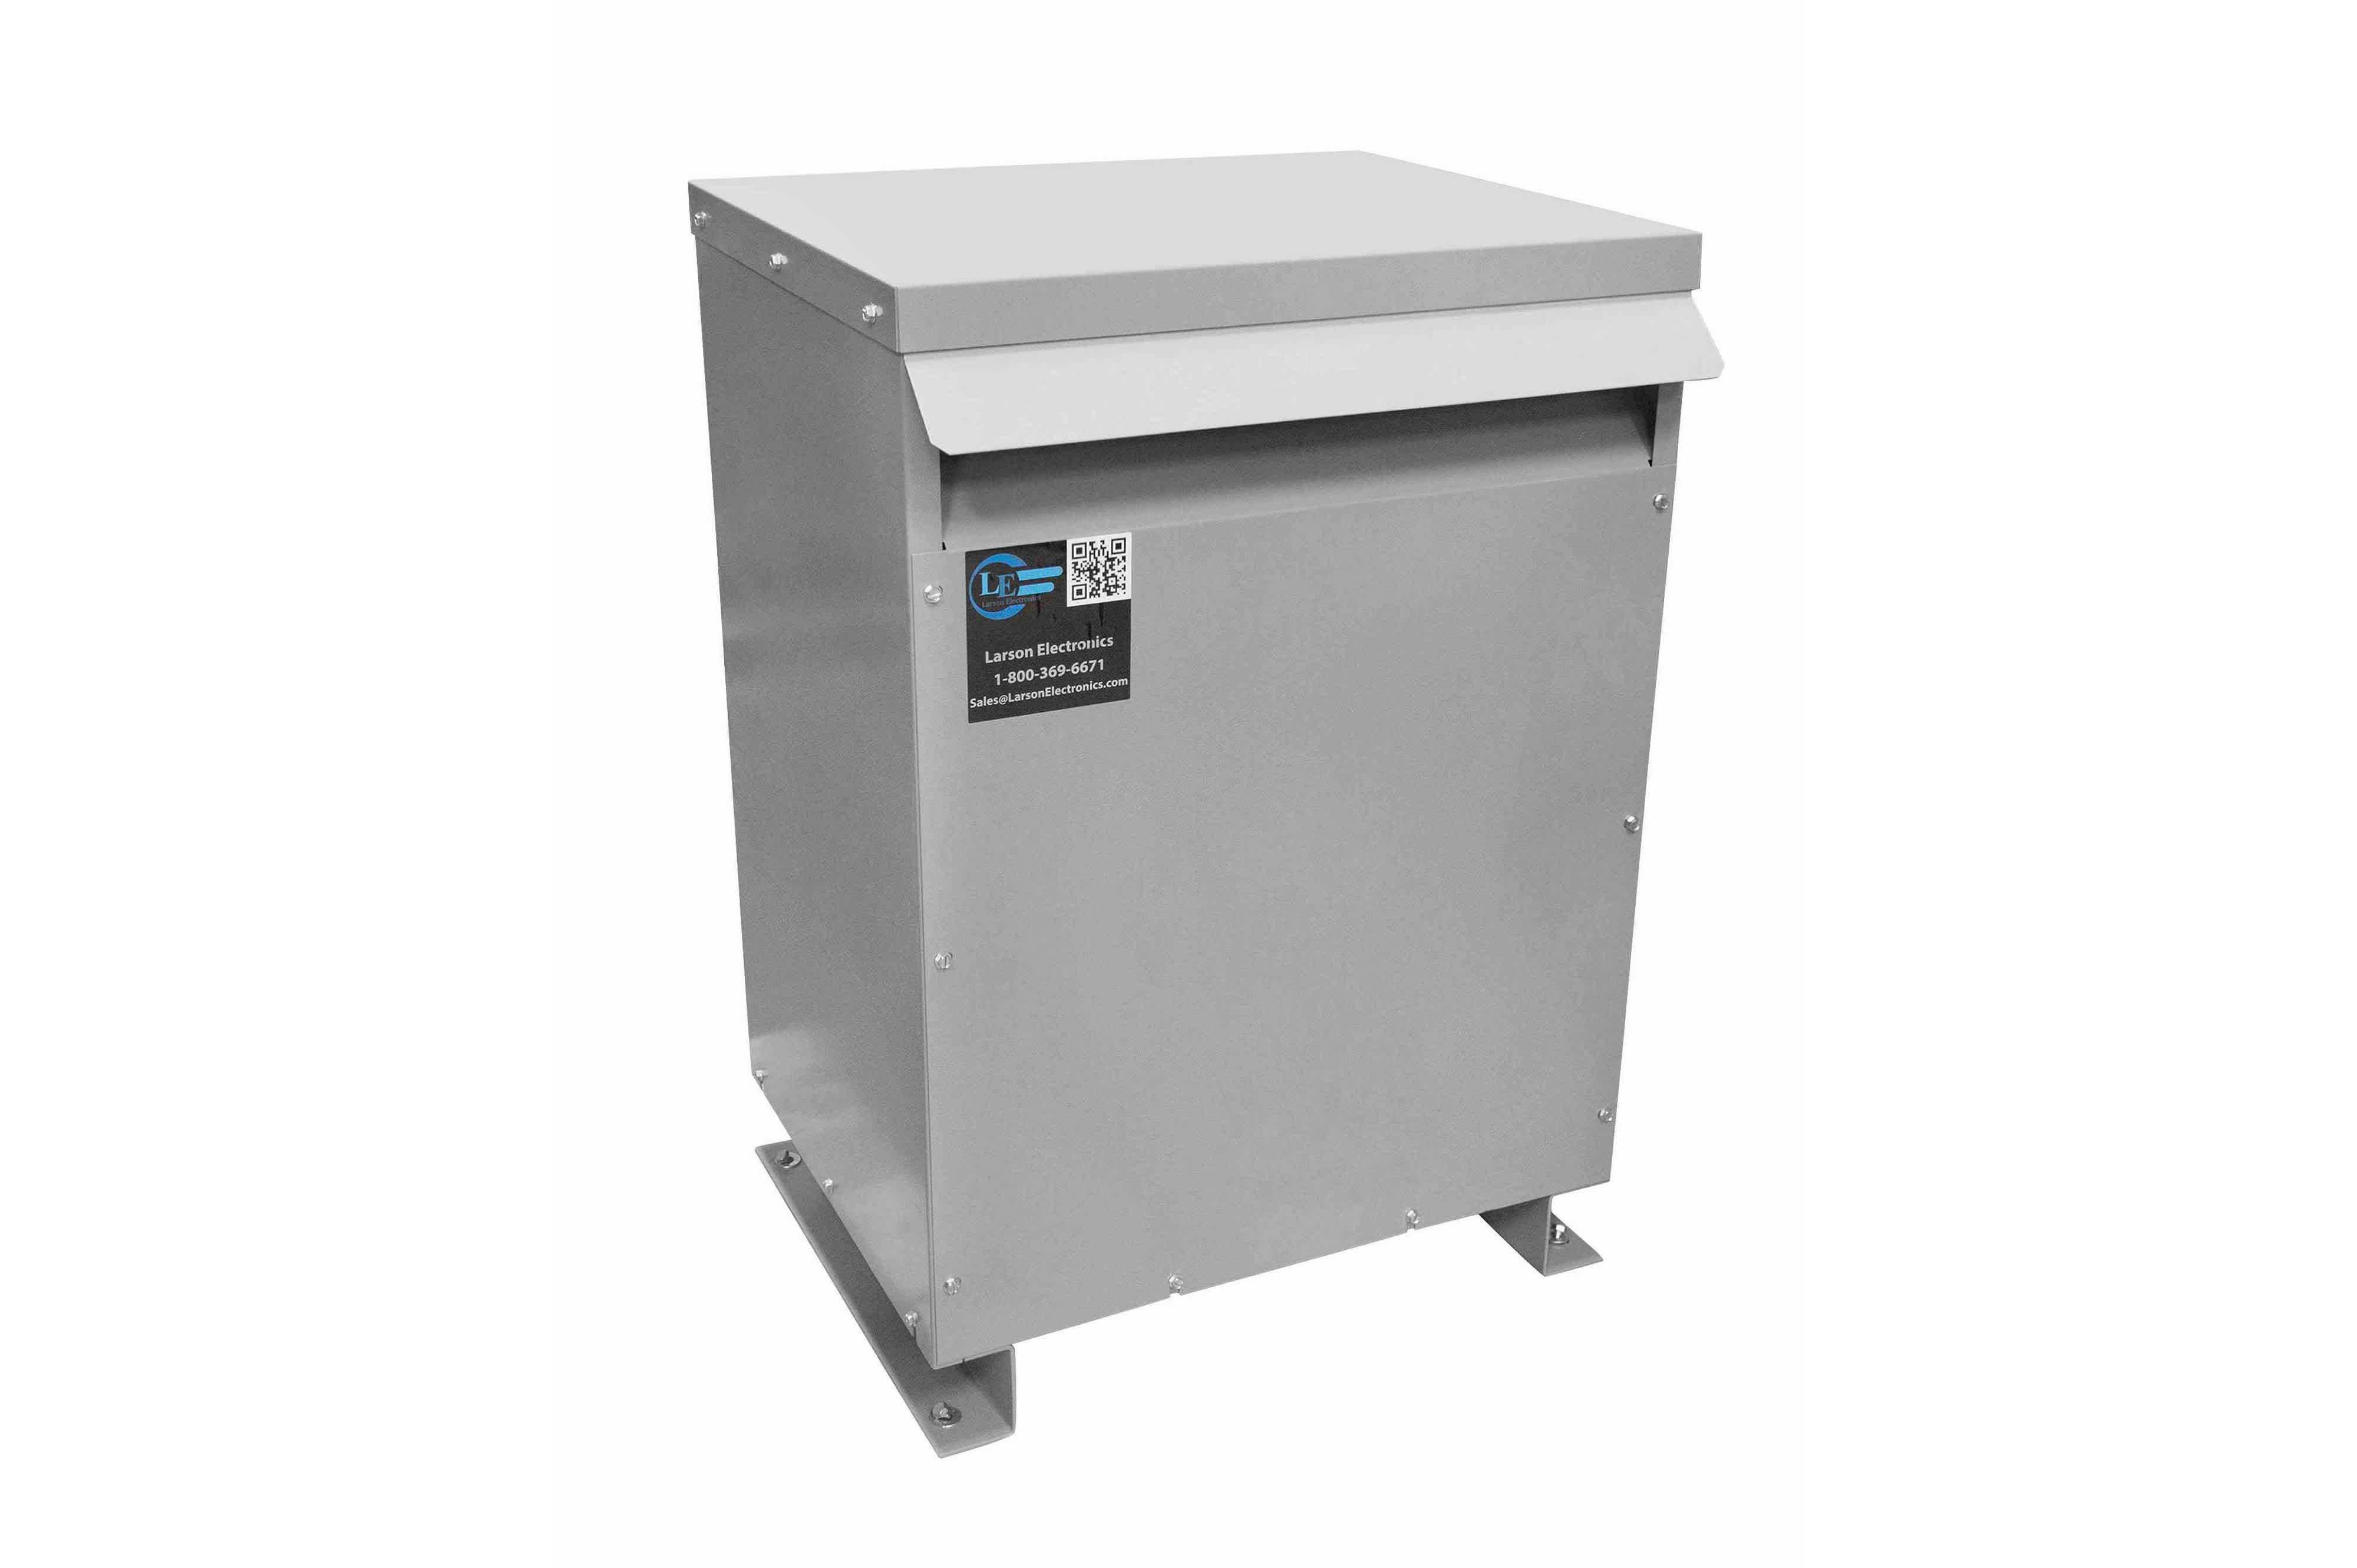 60 kVA 3PH DOE Transformer, 440V Delta Primary, 208Y/120 Wye-N Secondary, N3R, Ventilated, 60 Hz